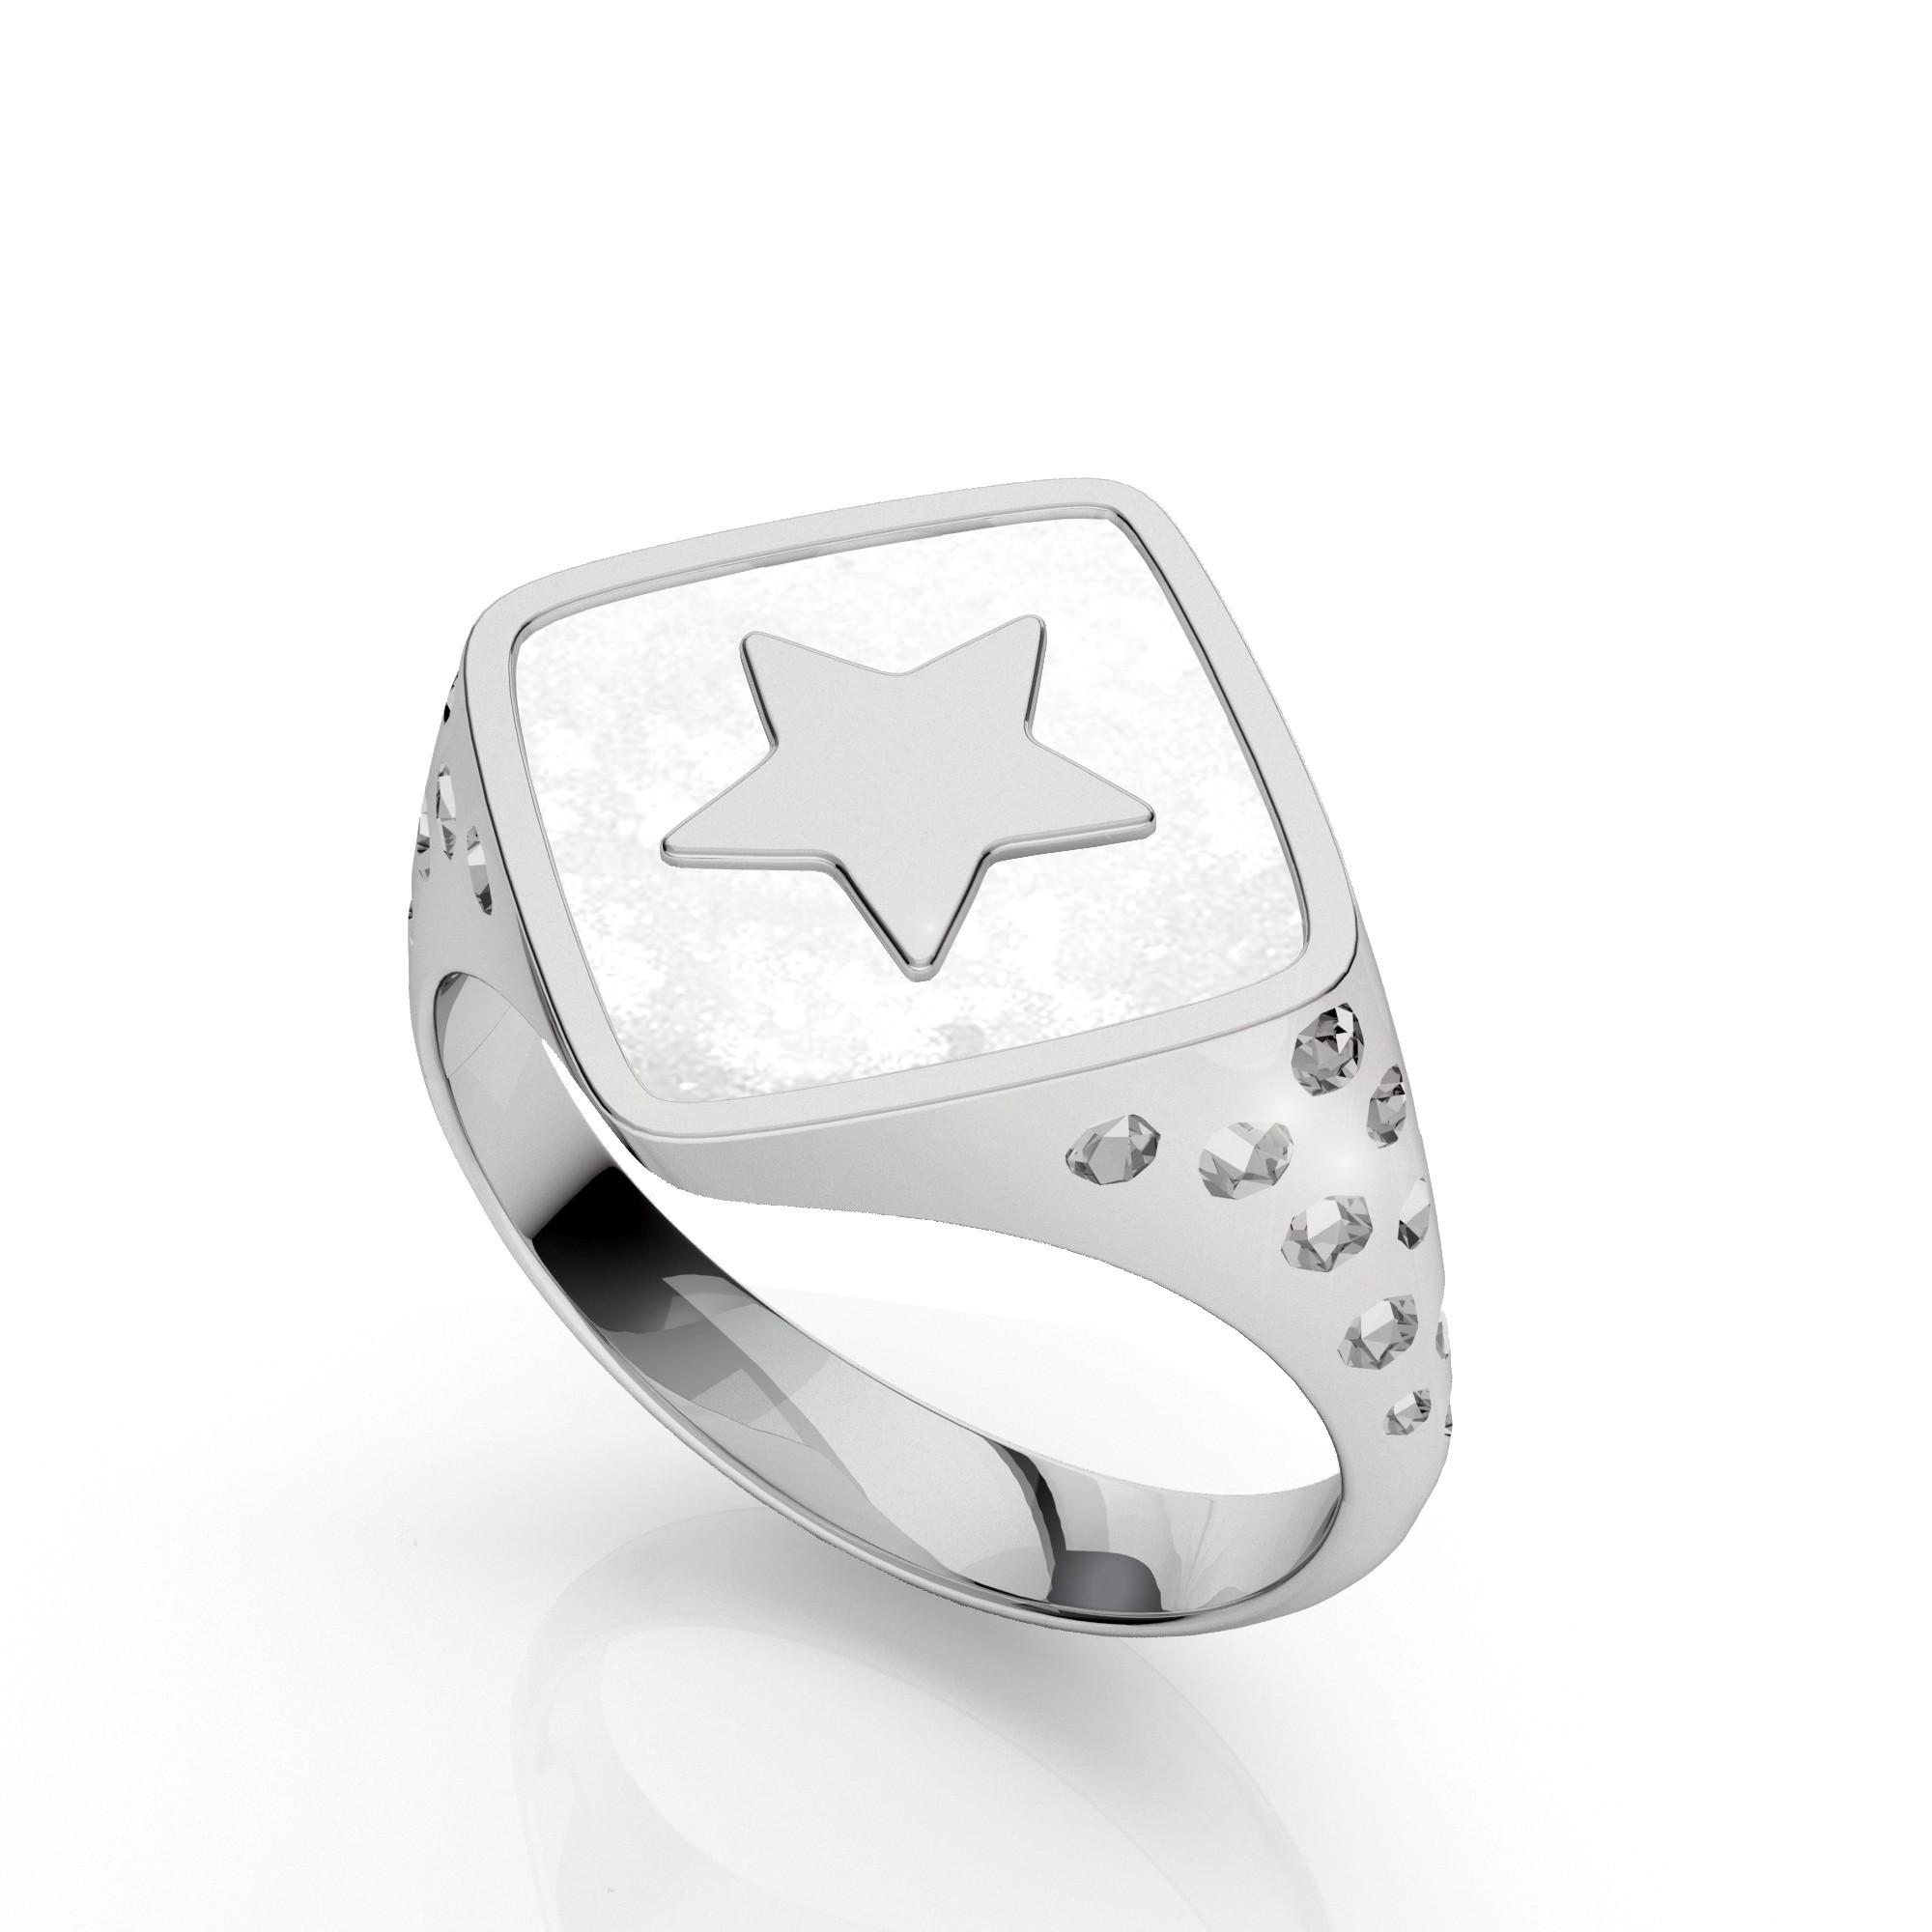 Star signet, sterling silver 925, MON DÉFI